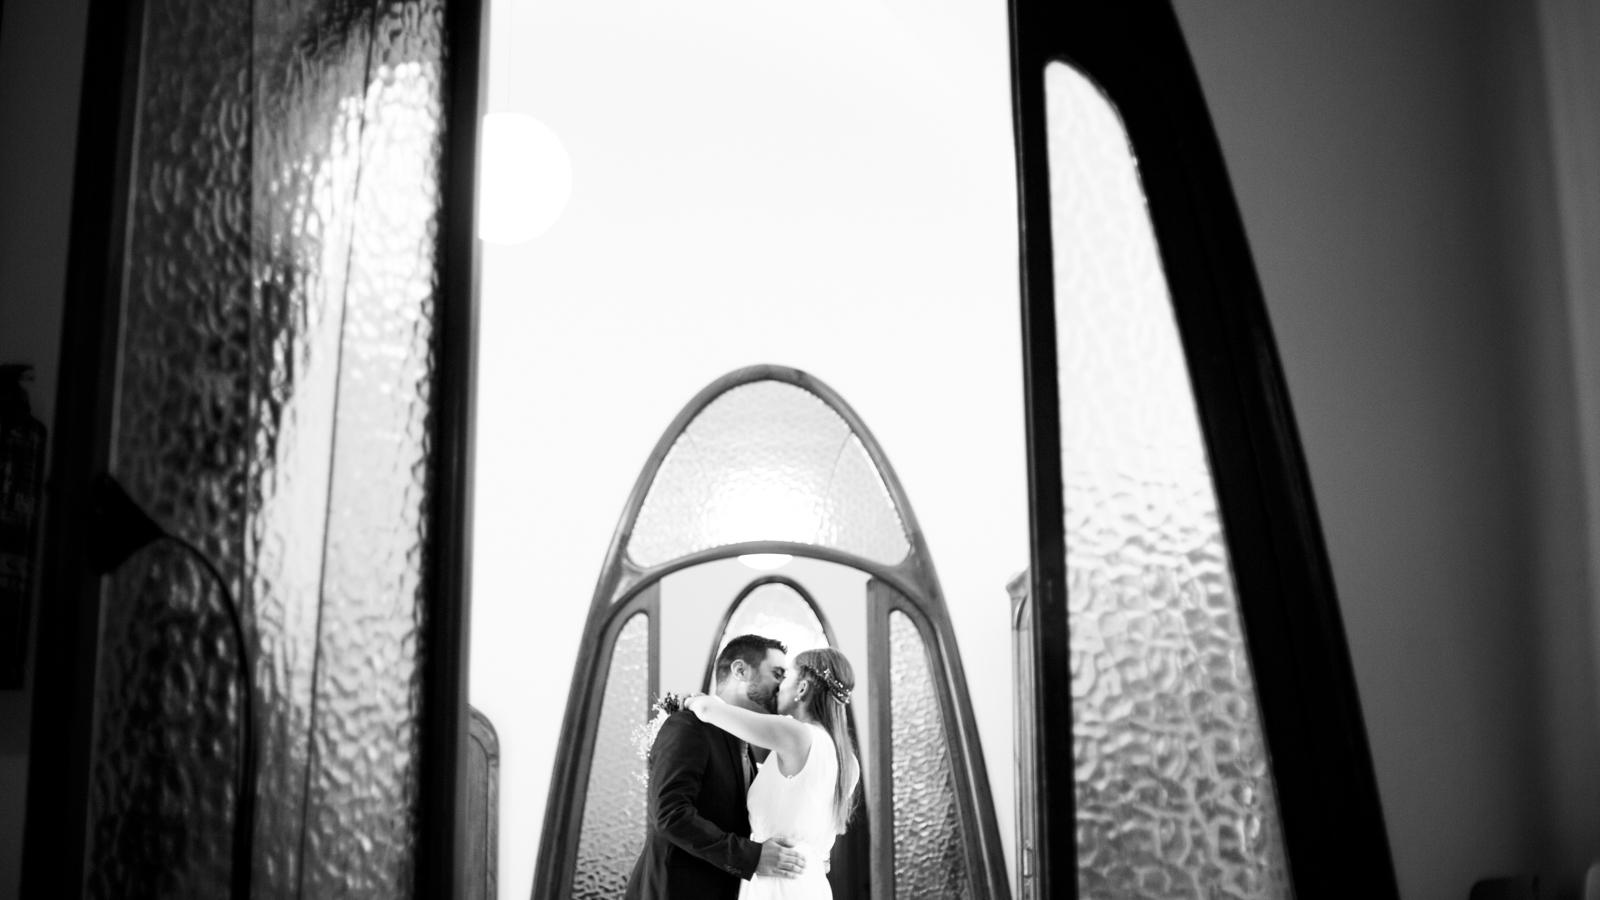 mia-moments-photo-boda-terrassa-mas-bonvilar-fotografia-146.jpg